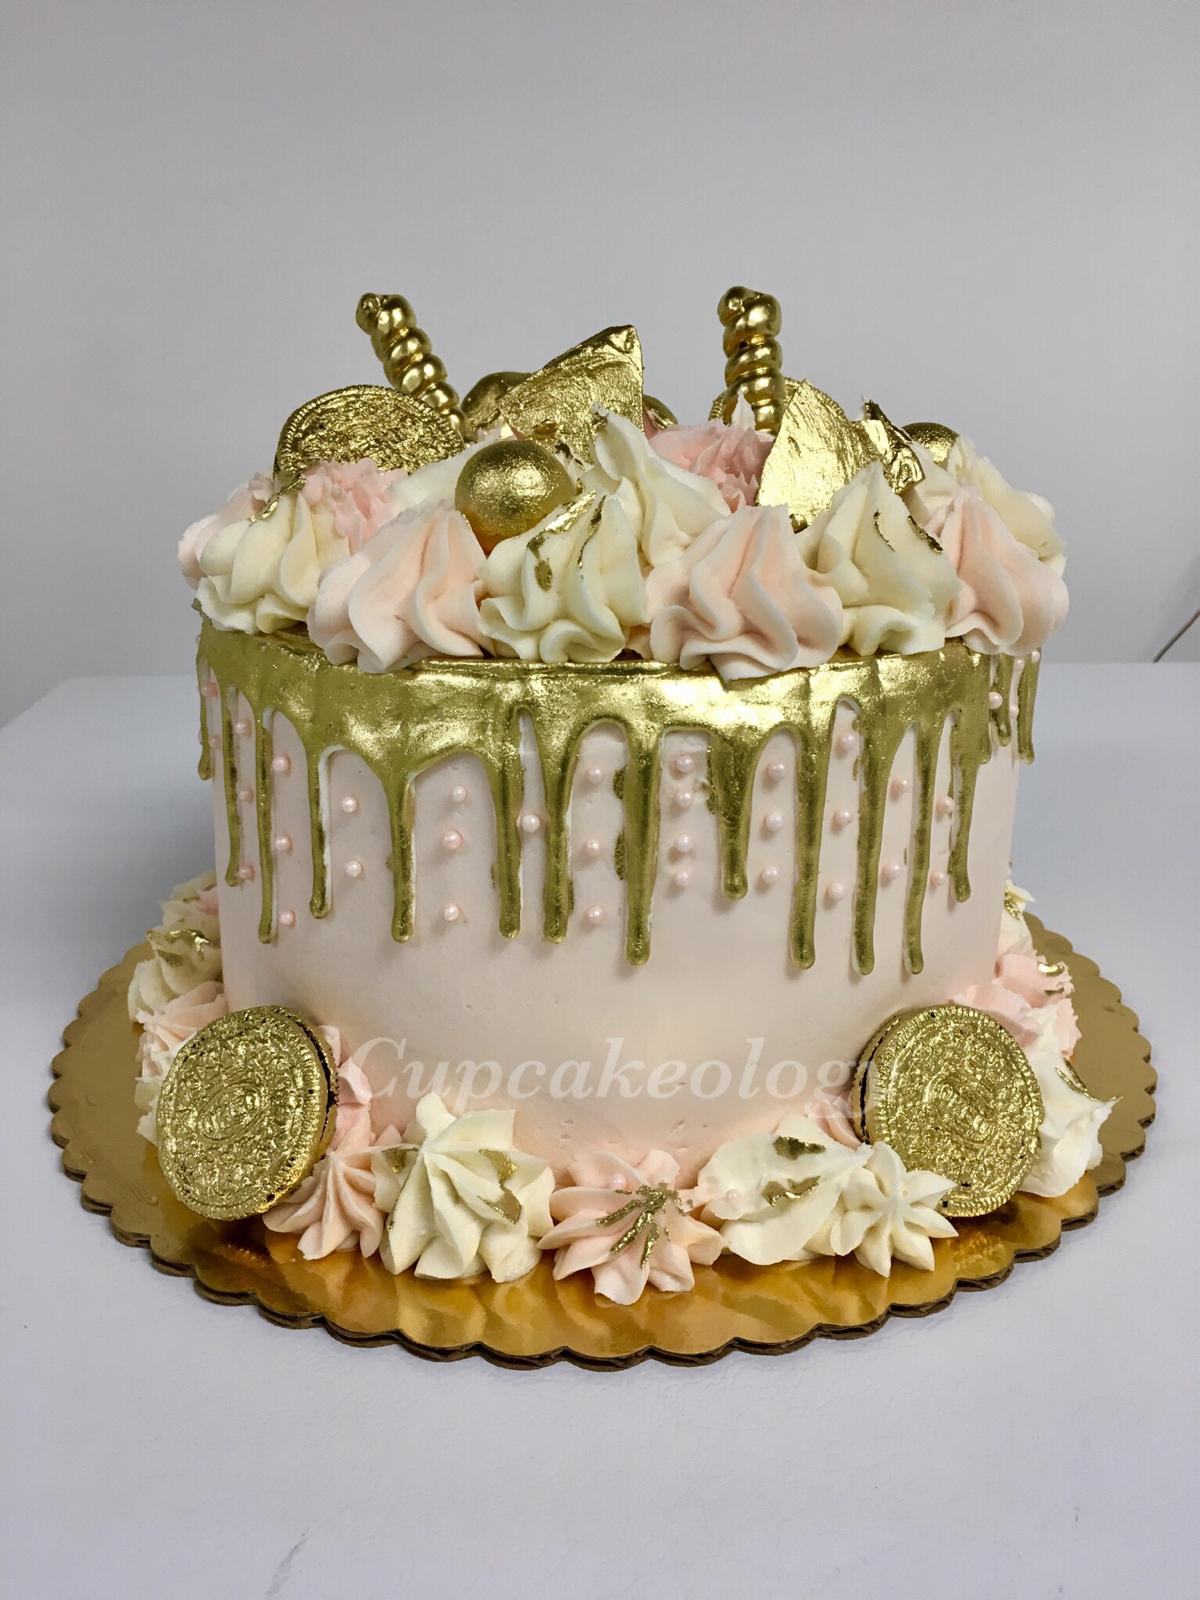 Gold Drip Cake Drip Cakes Novelty Birthday Cakes Drip Cake Tutorial